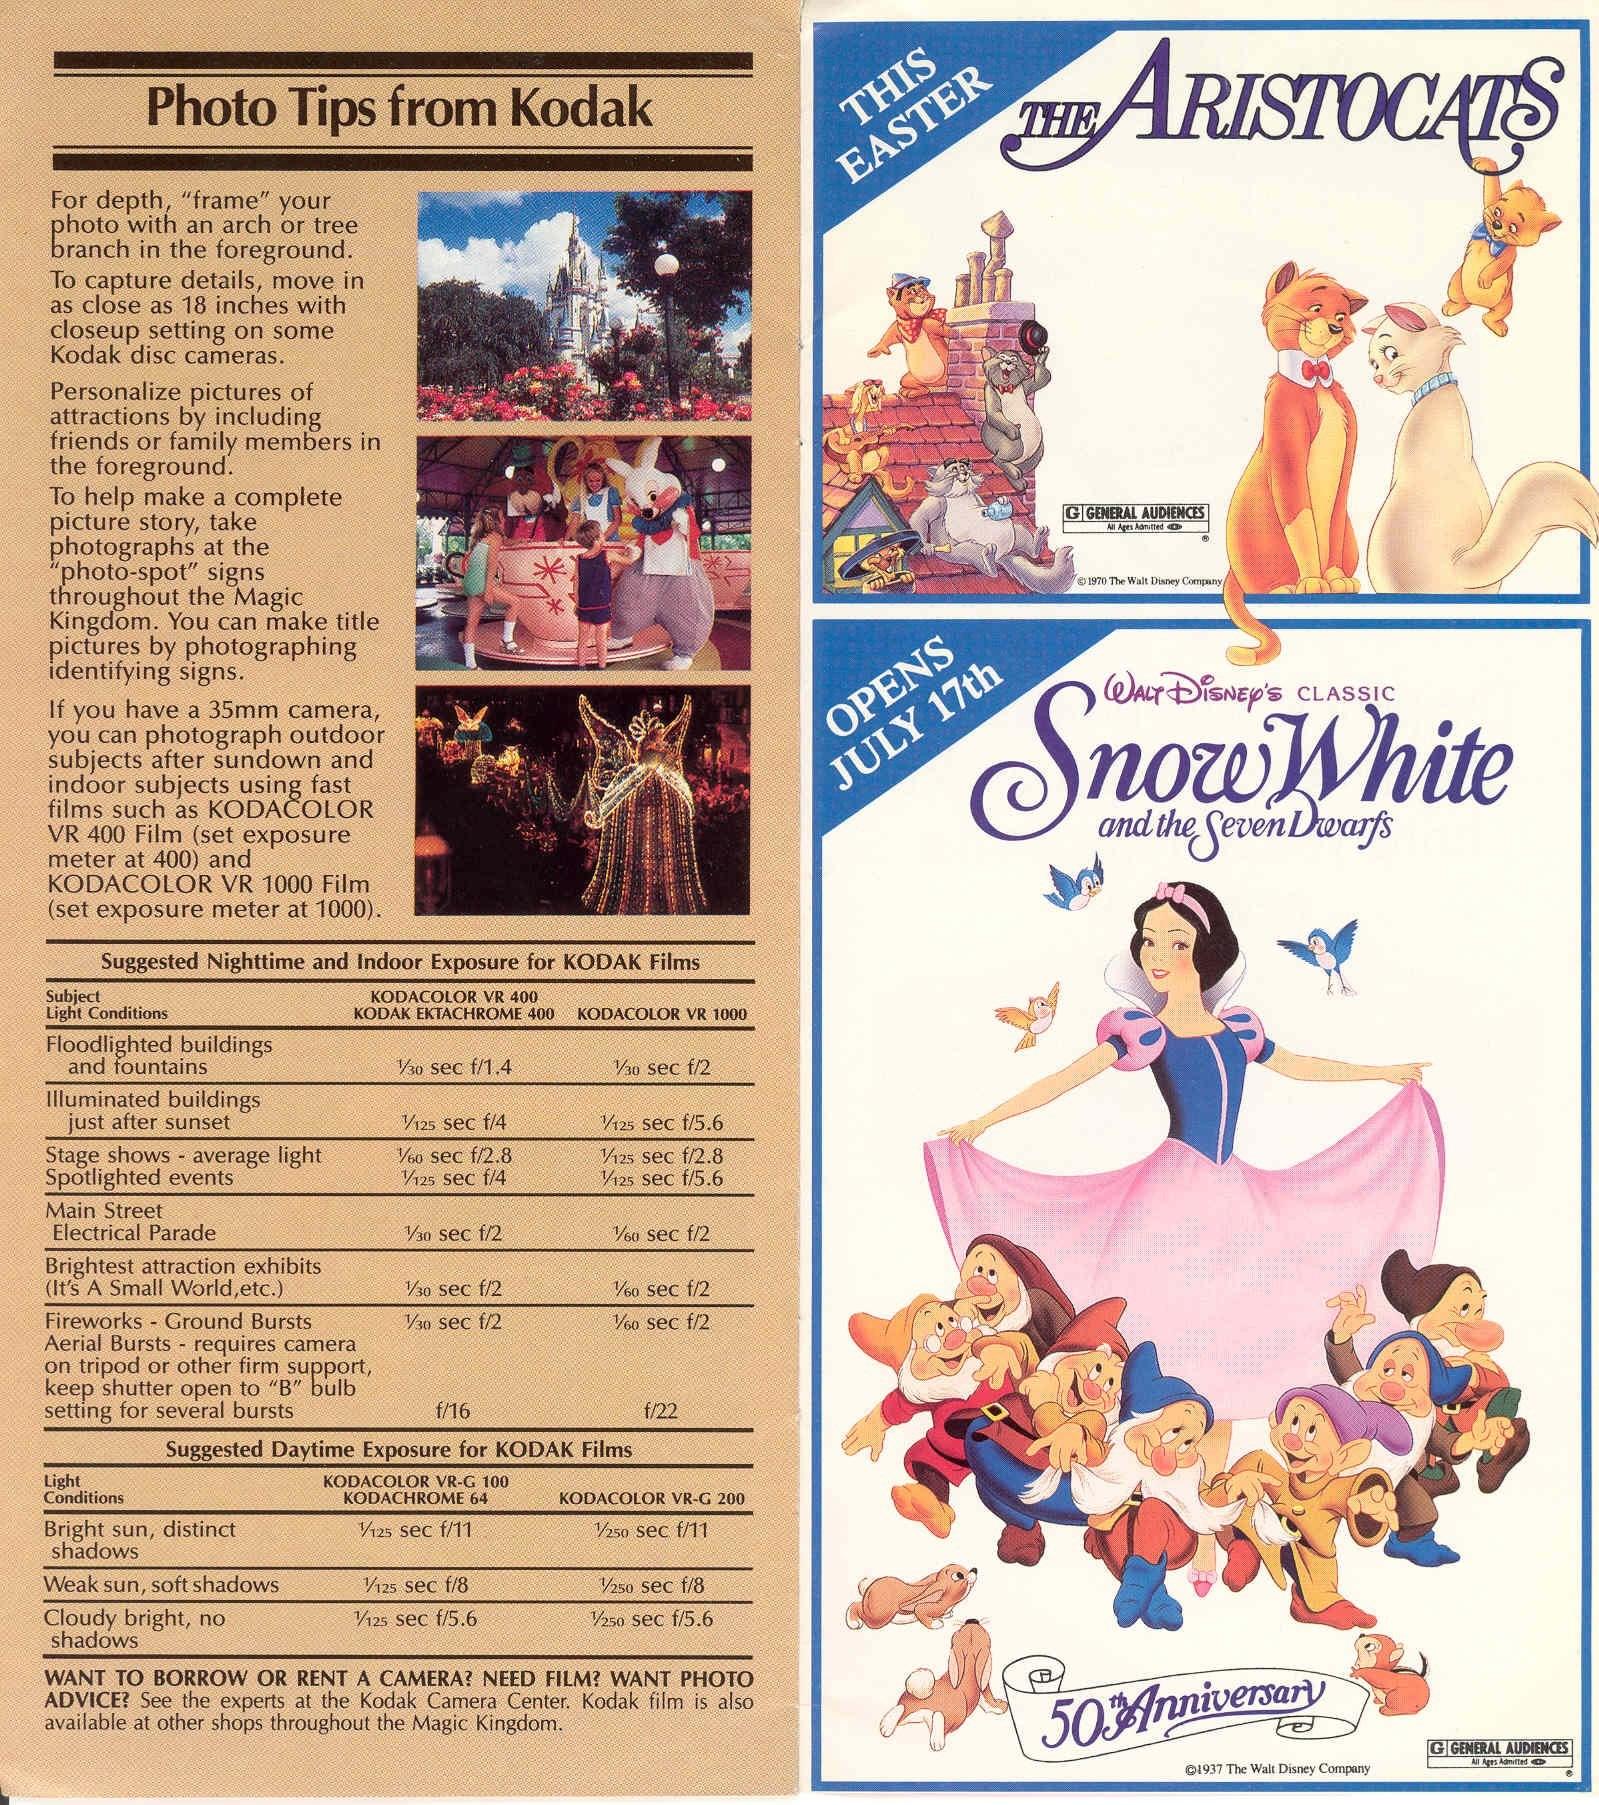 Magic Kingdom Guide Book 1986